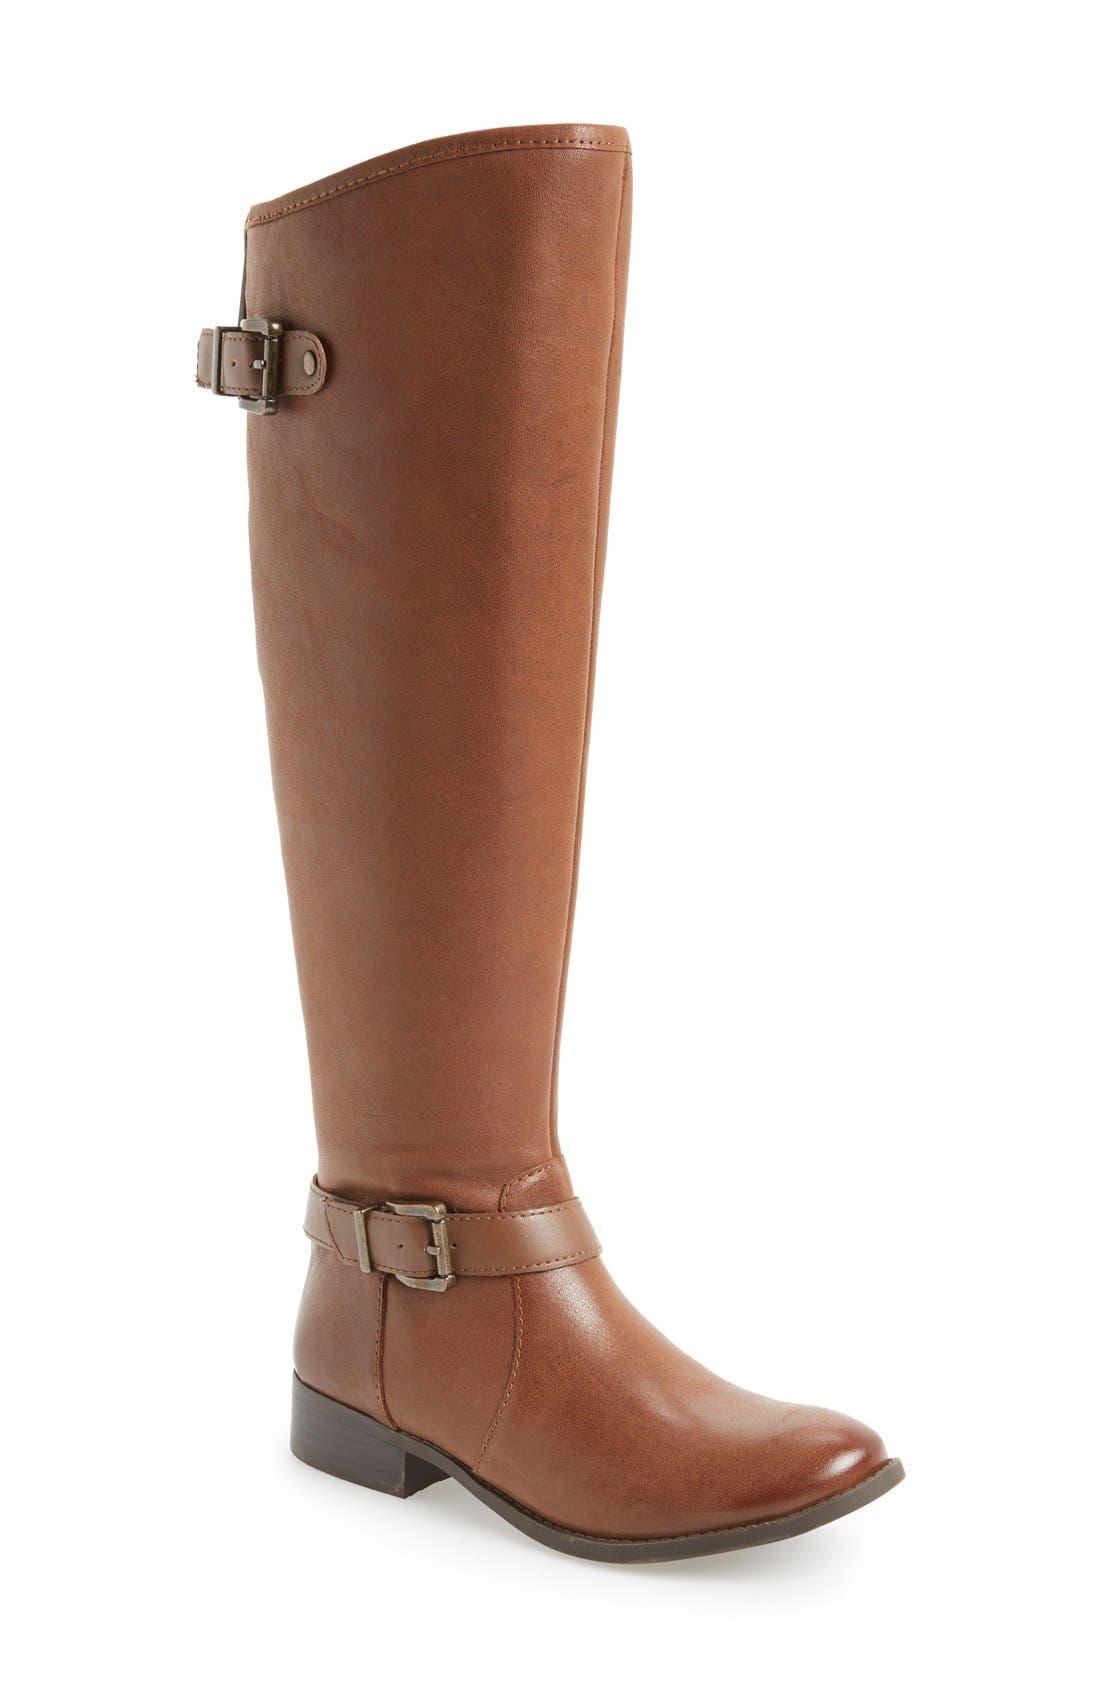 Main Image - Jessica Simpson 'Rinne' Riding Boot (Women)